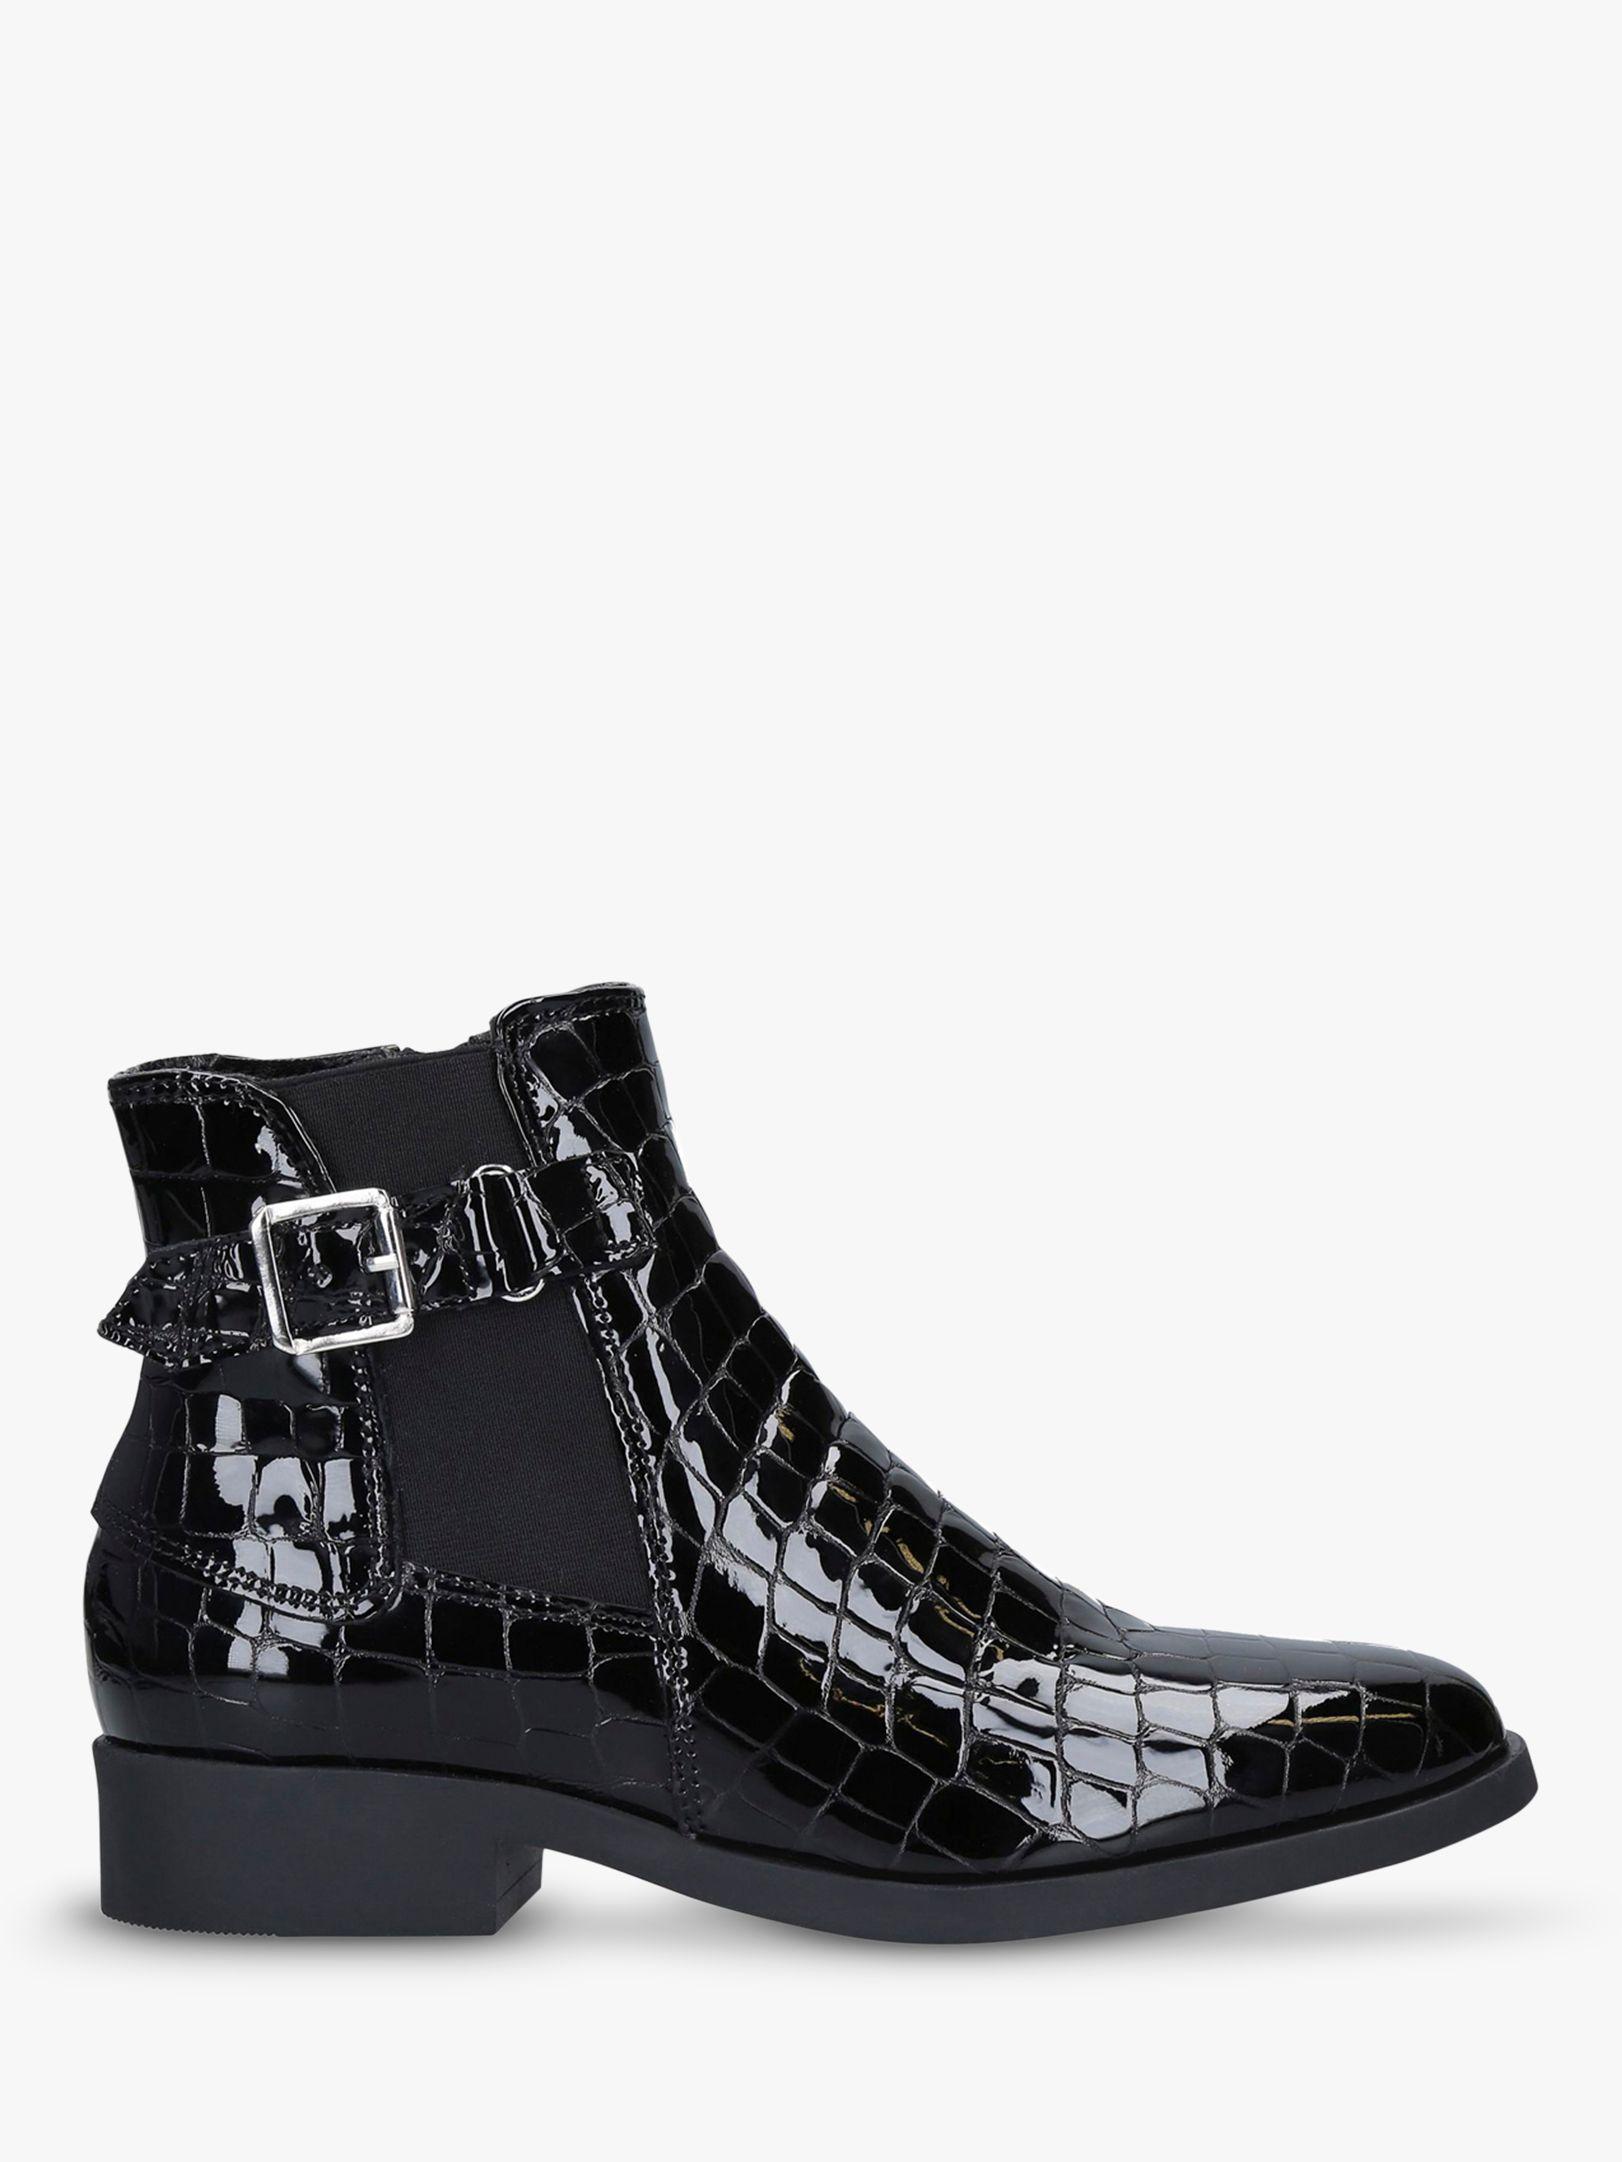 Carvela Comfort Carvela Comfort Rich Croc Effect Ankle Boots, Black